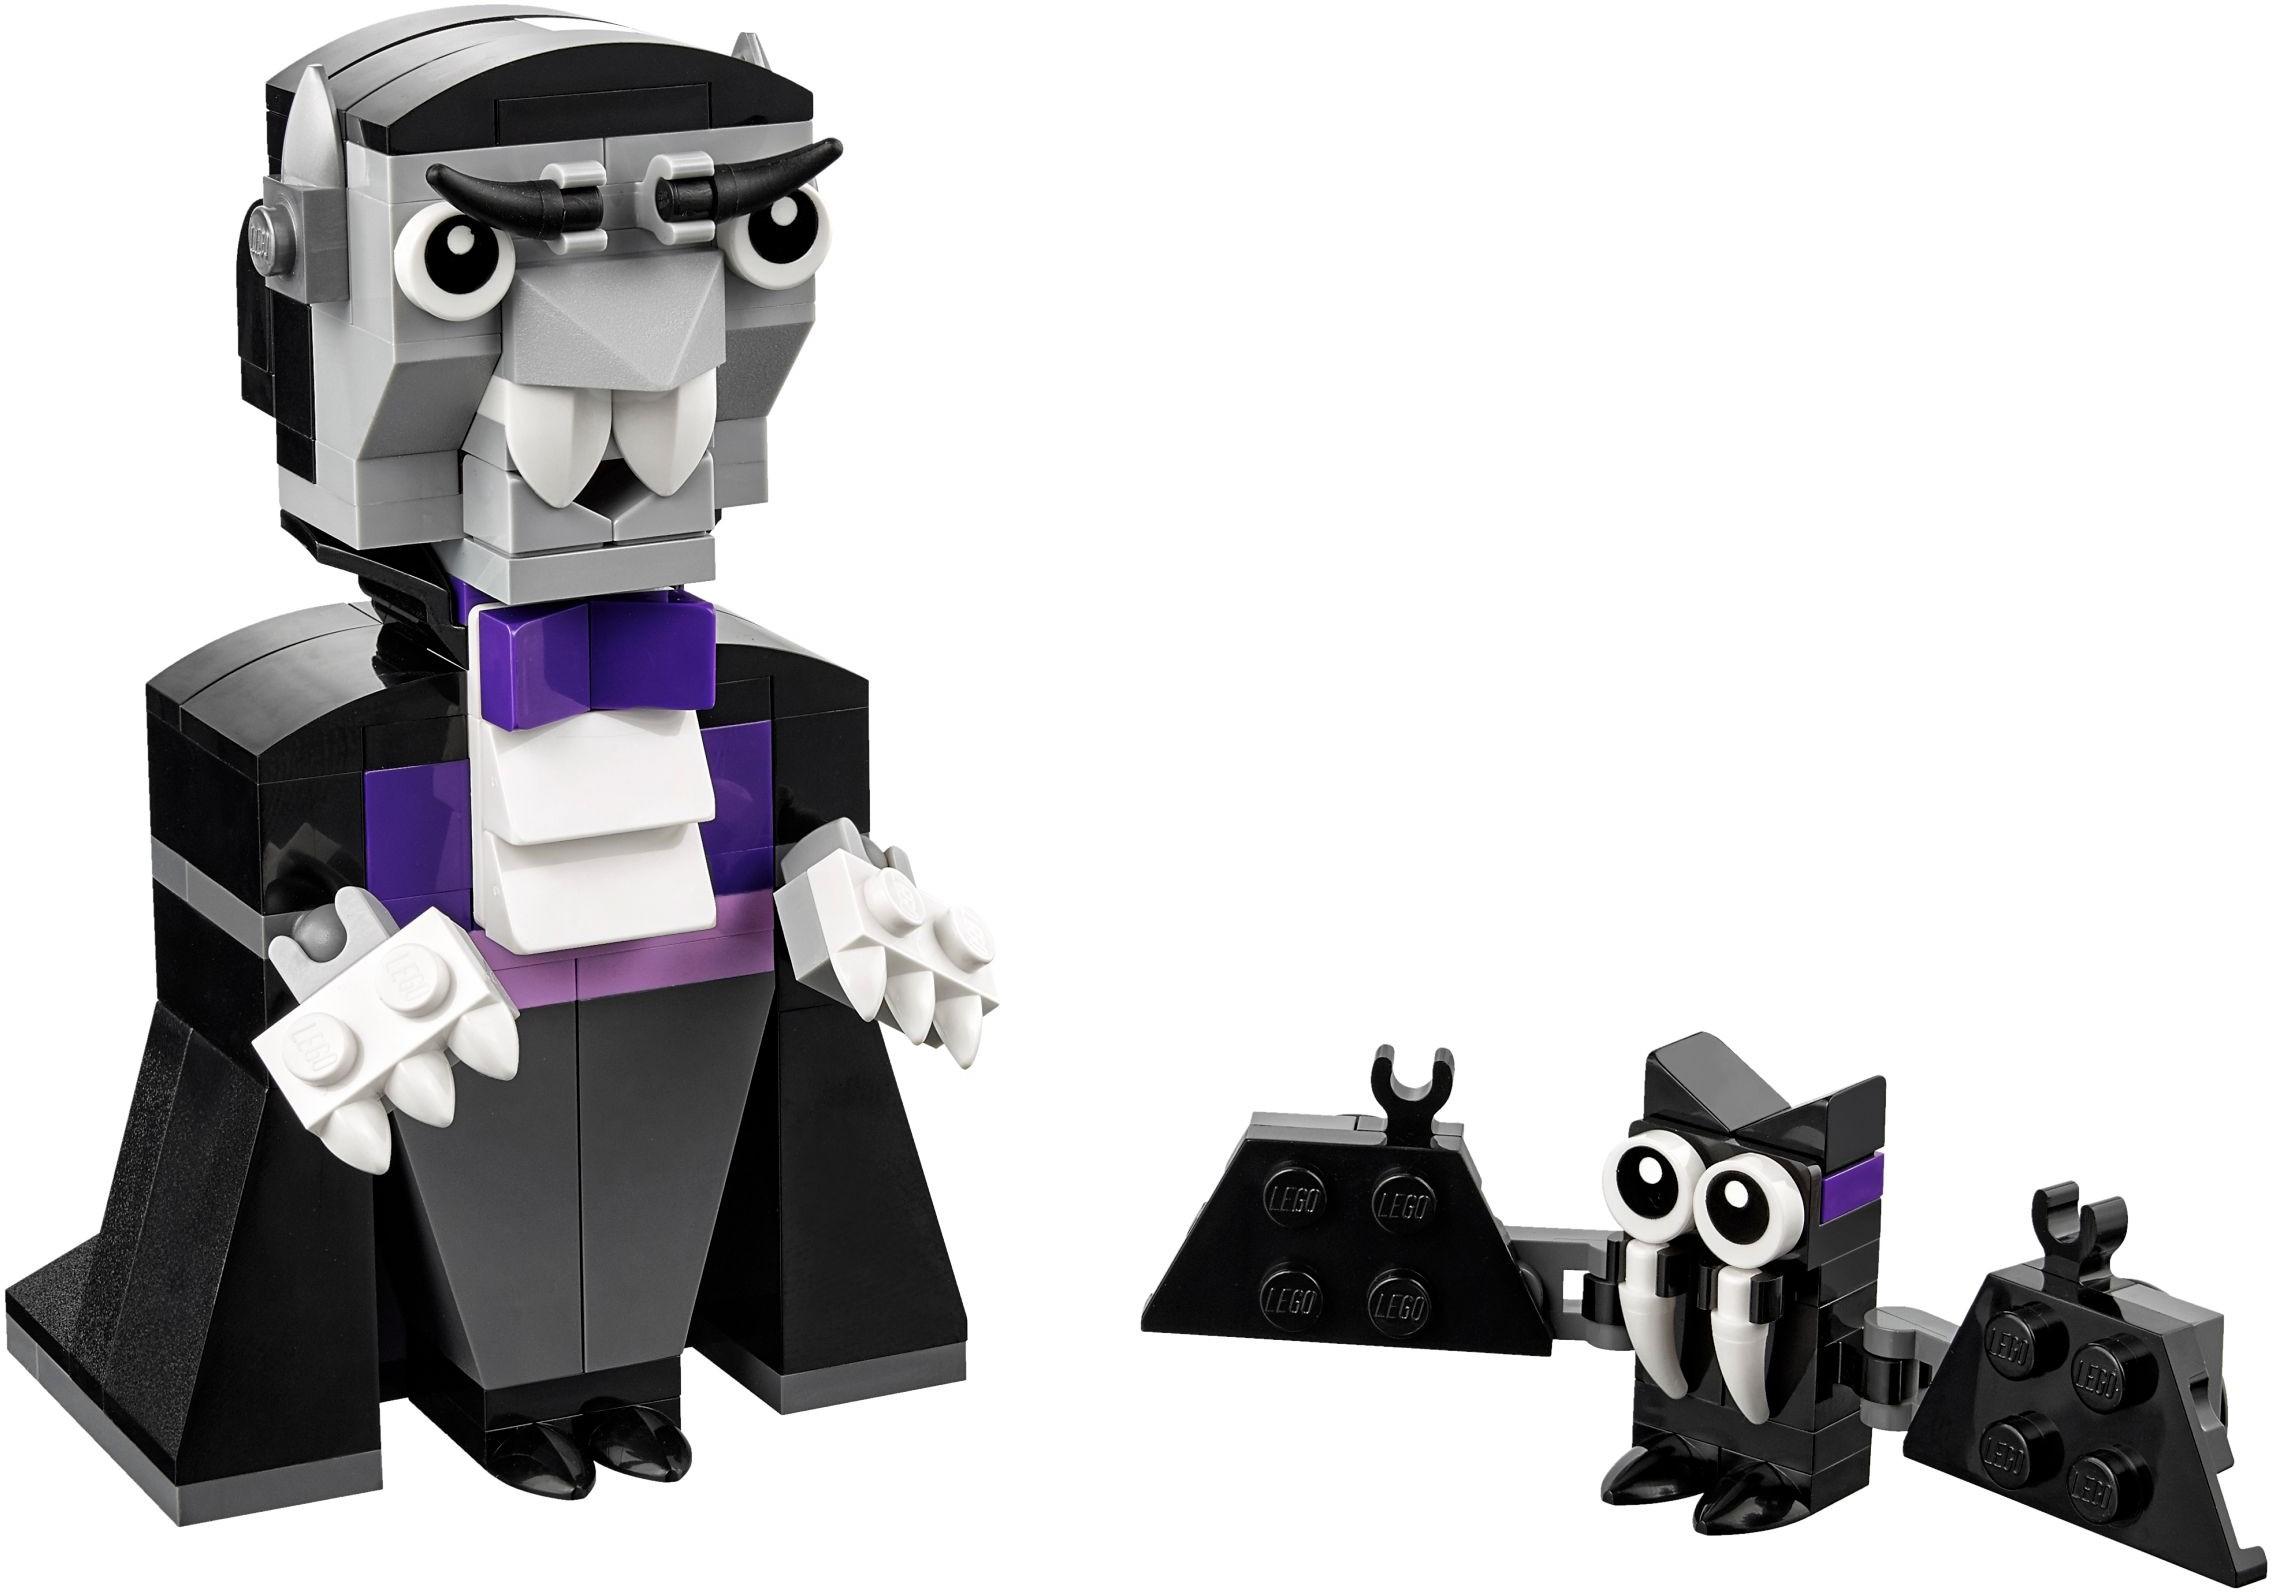 lego vampires brick built set